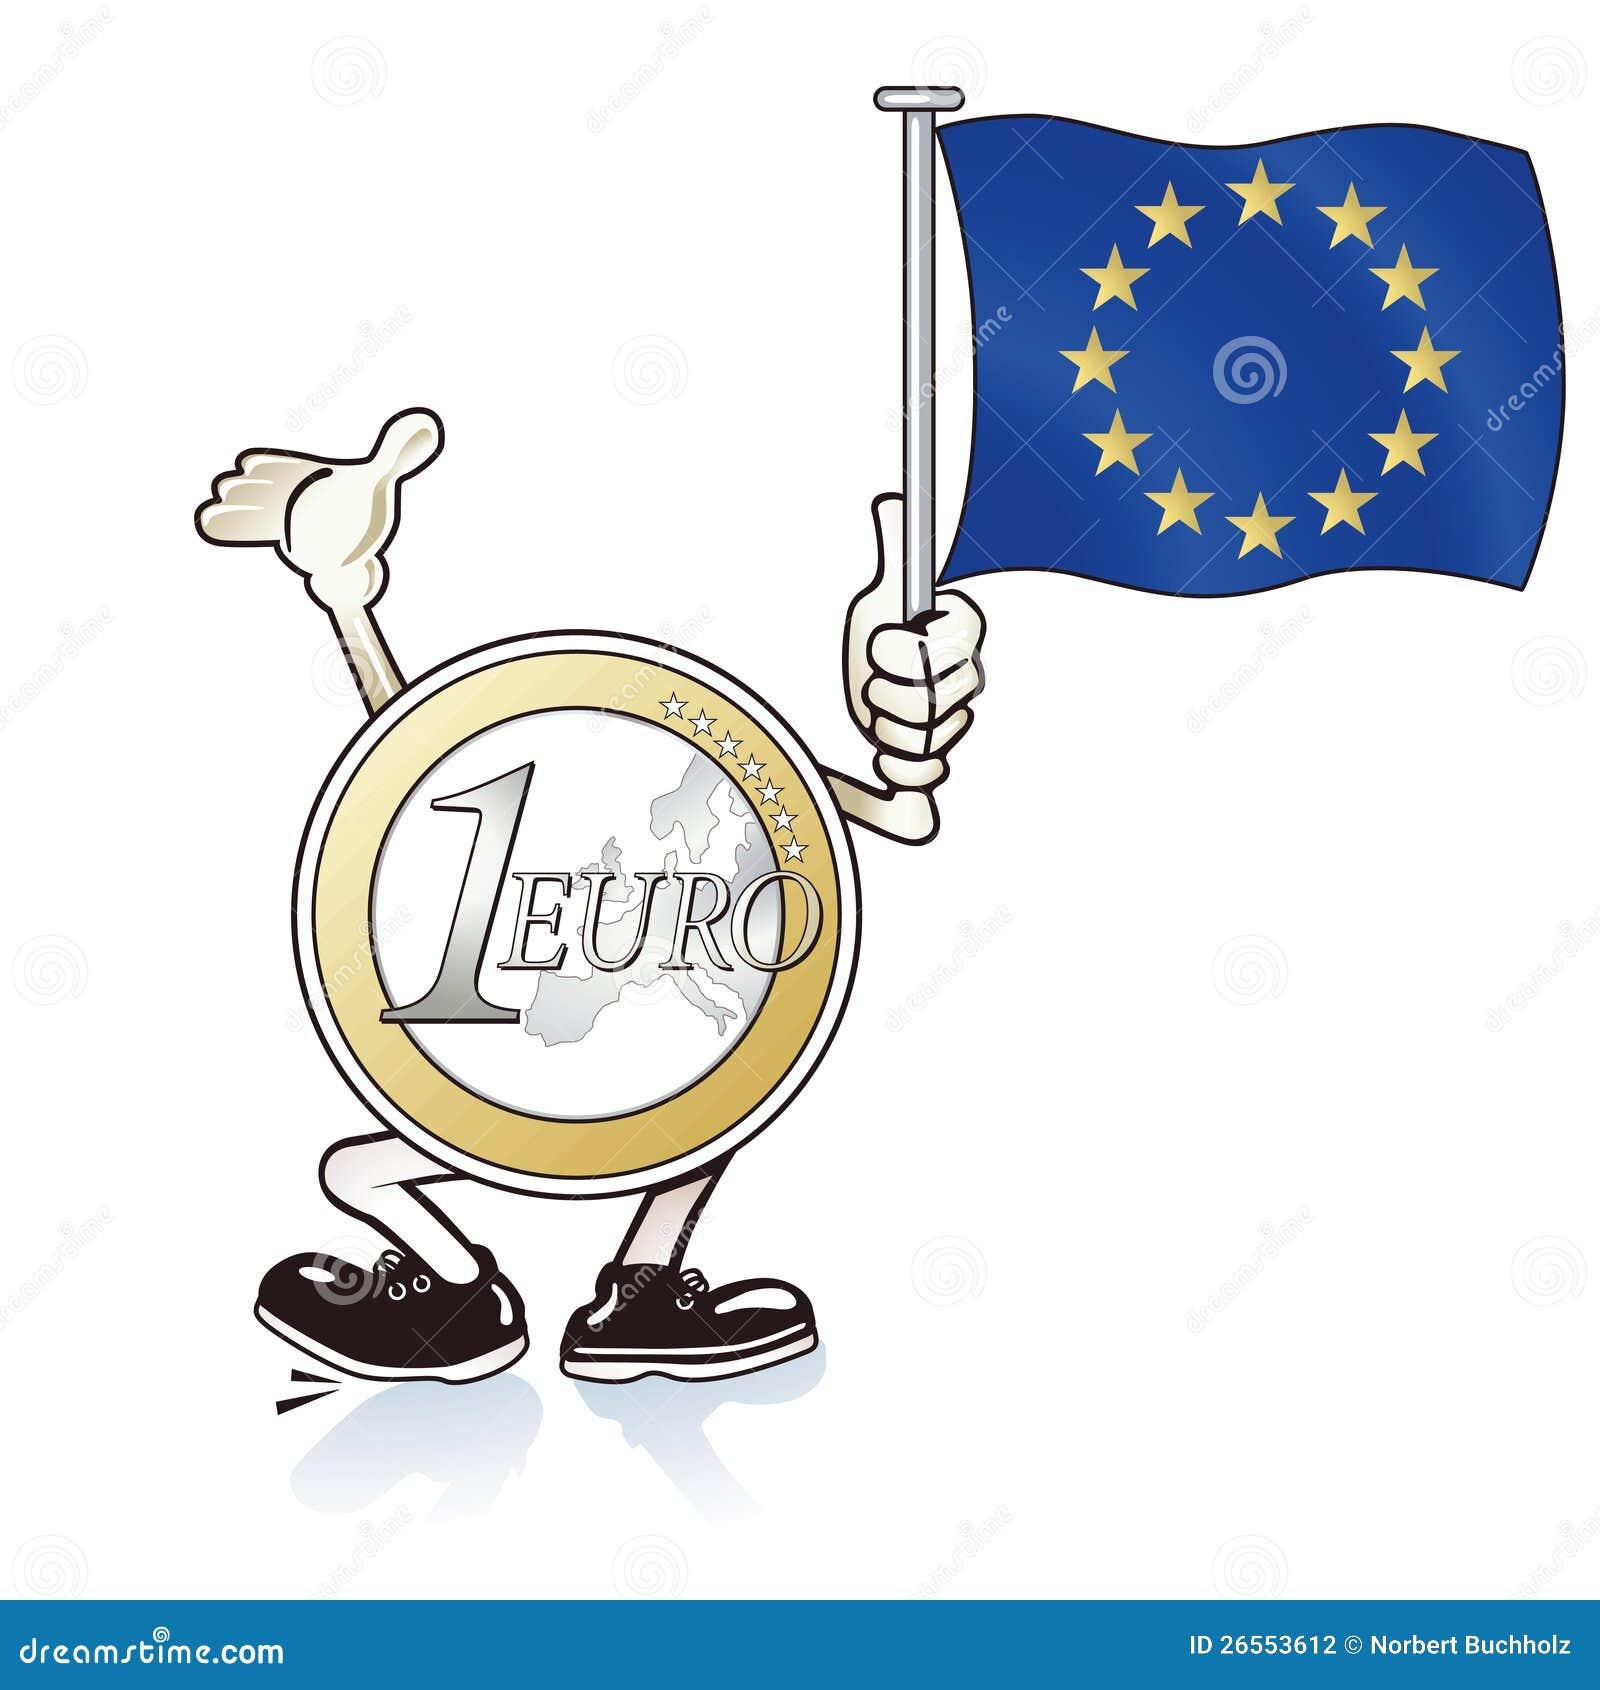 Cartoon illustration of Euro coin figure waving European flag for help ...